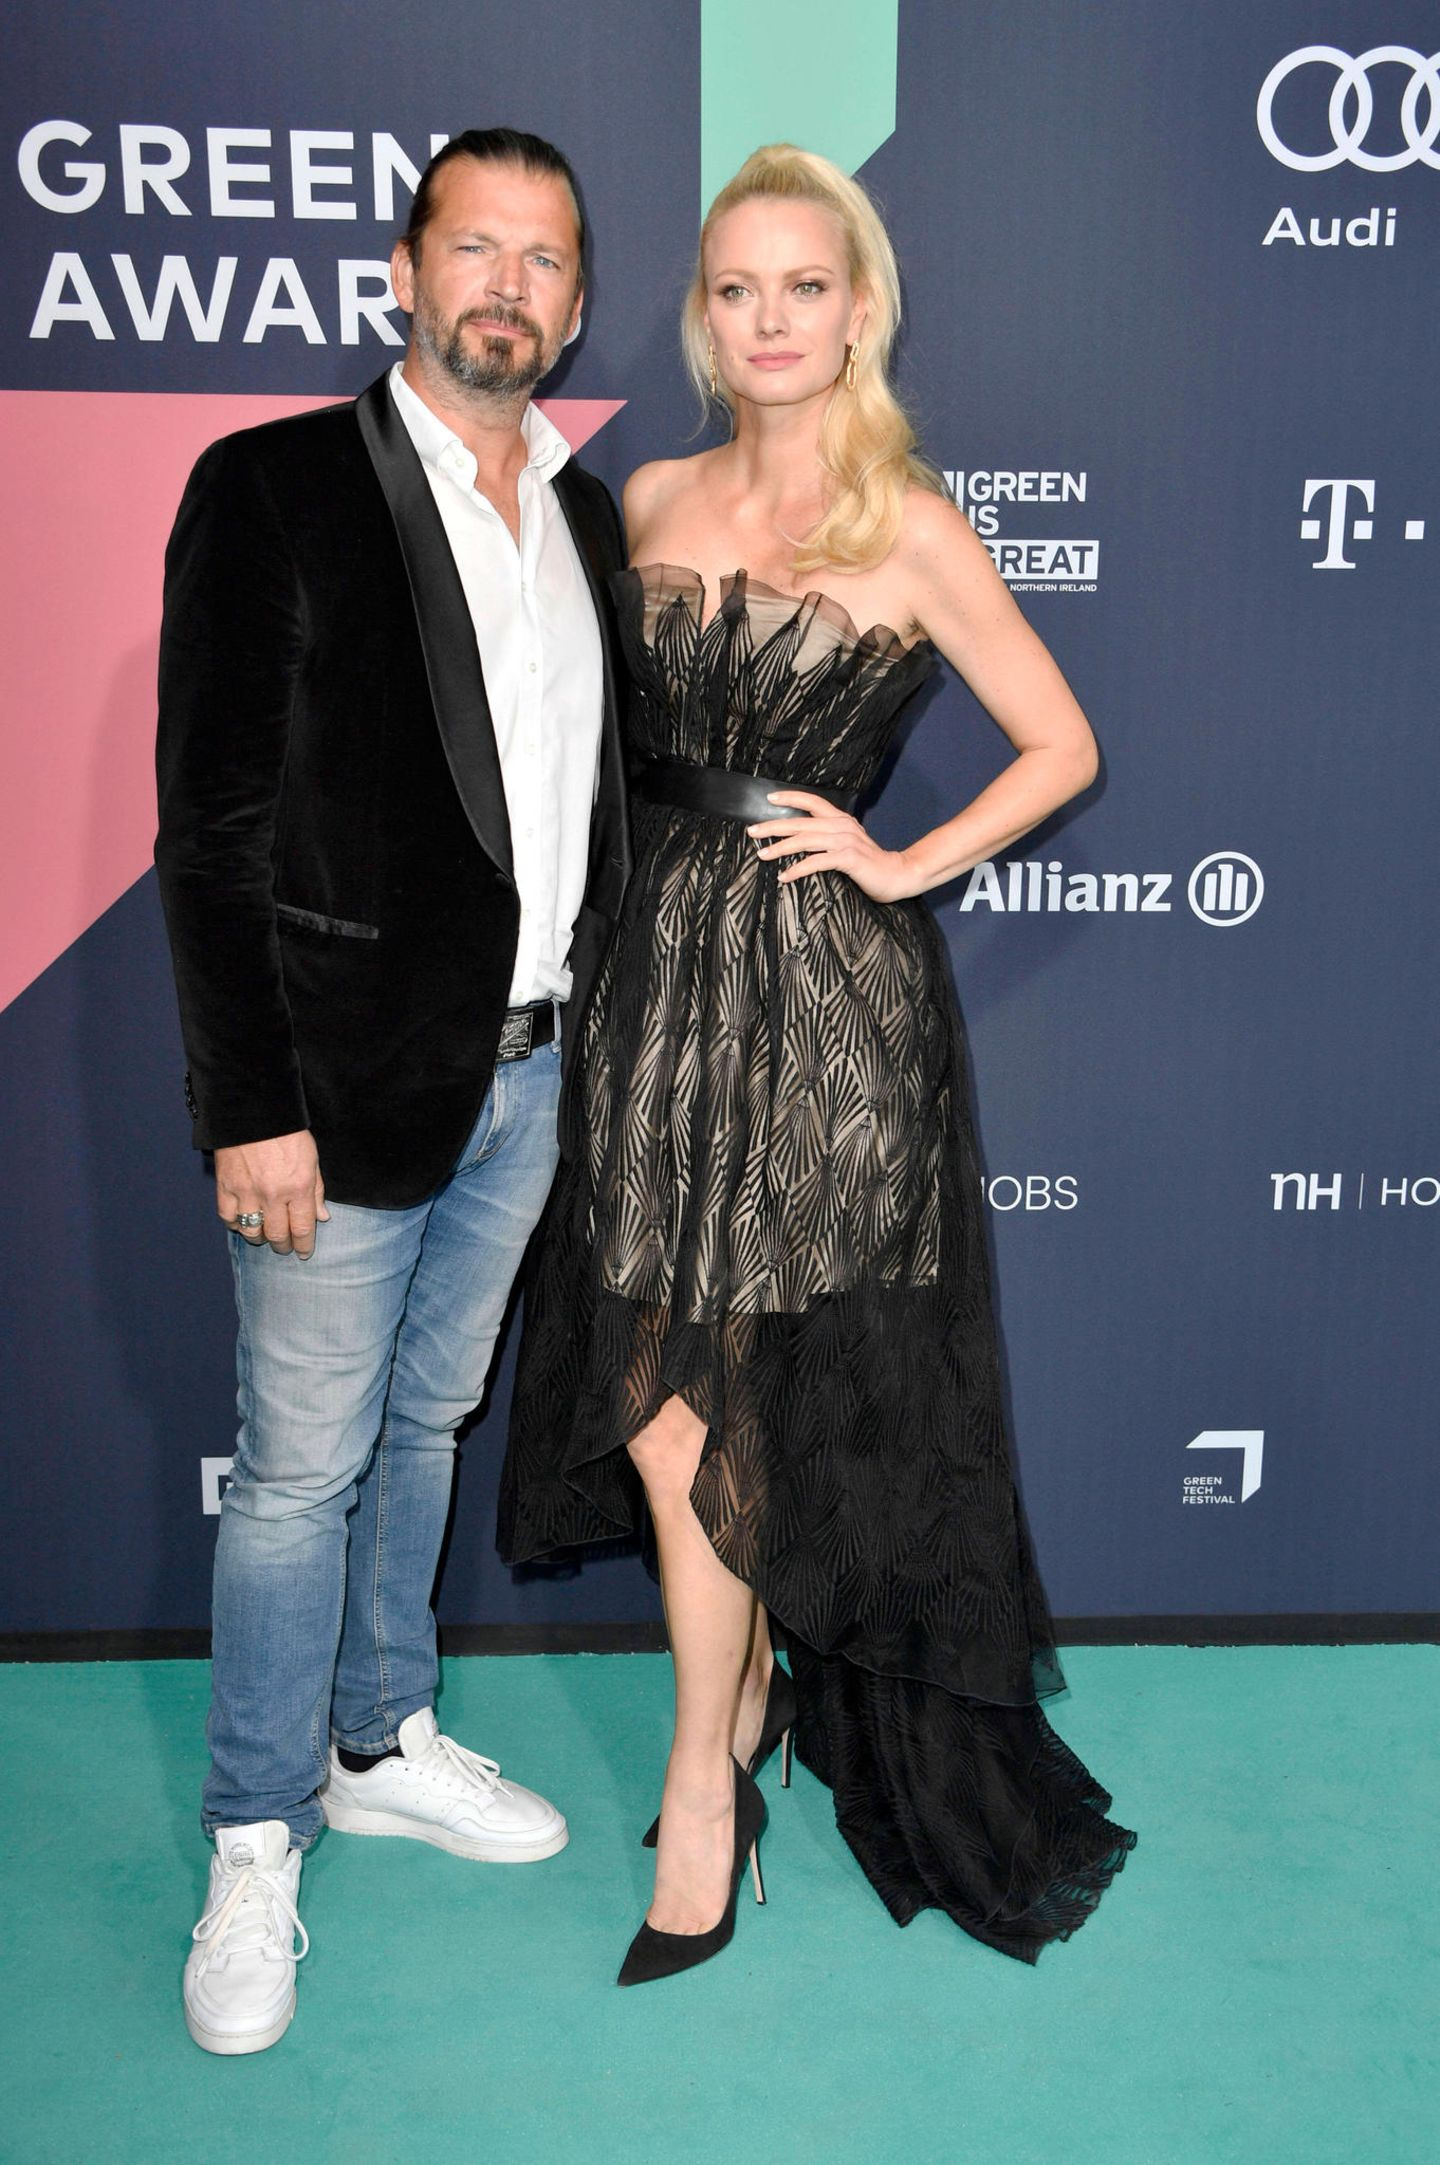 Promi-Paare: Franziska Knuppe und Christian Möstl